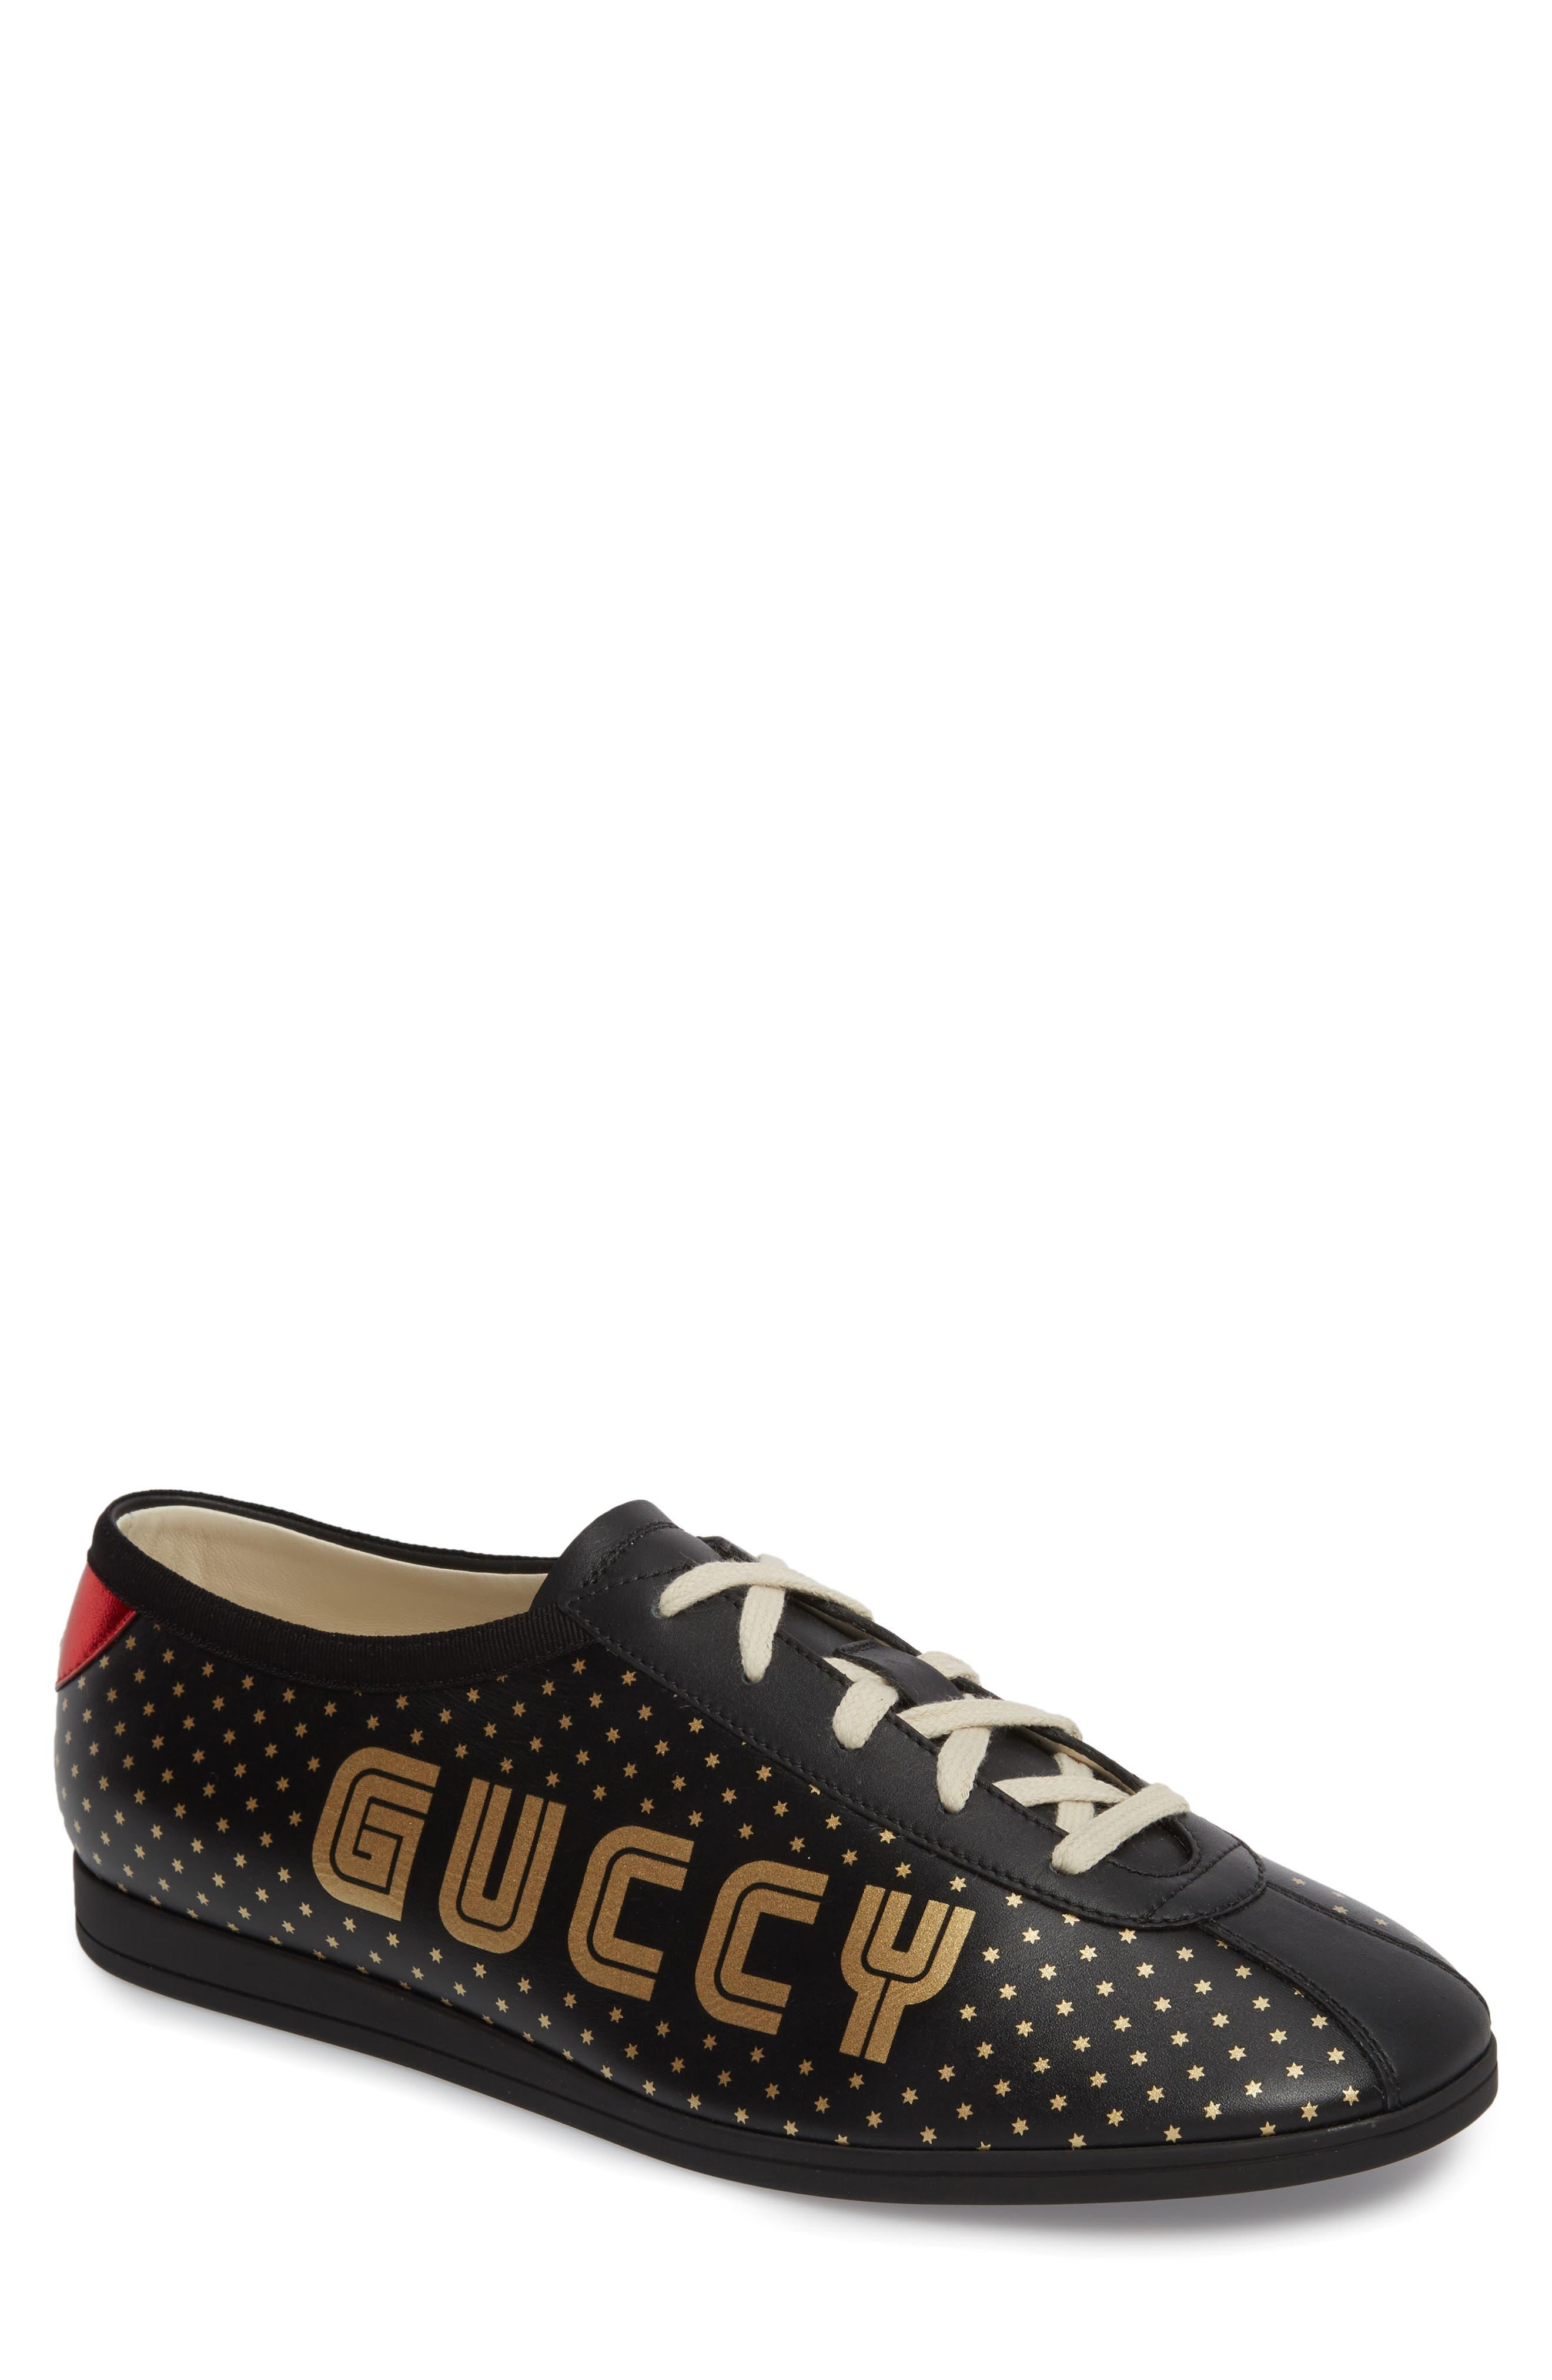 Falacer Guccy Low Top Sneaker,                         Main,                         color, Black/ Tan